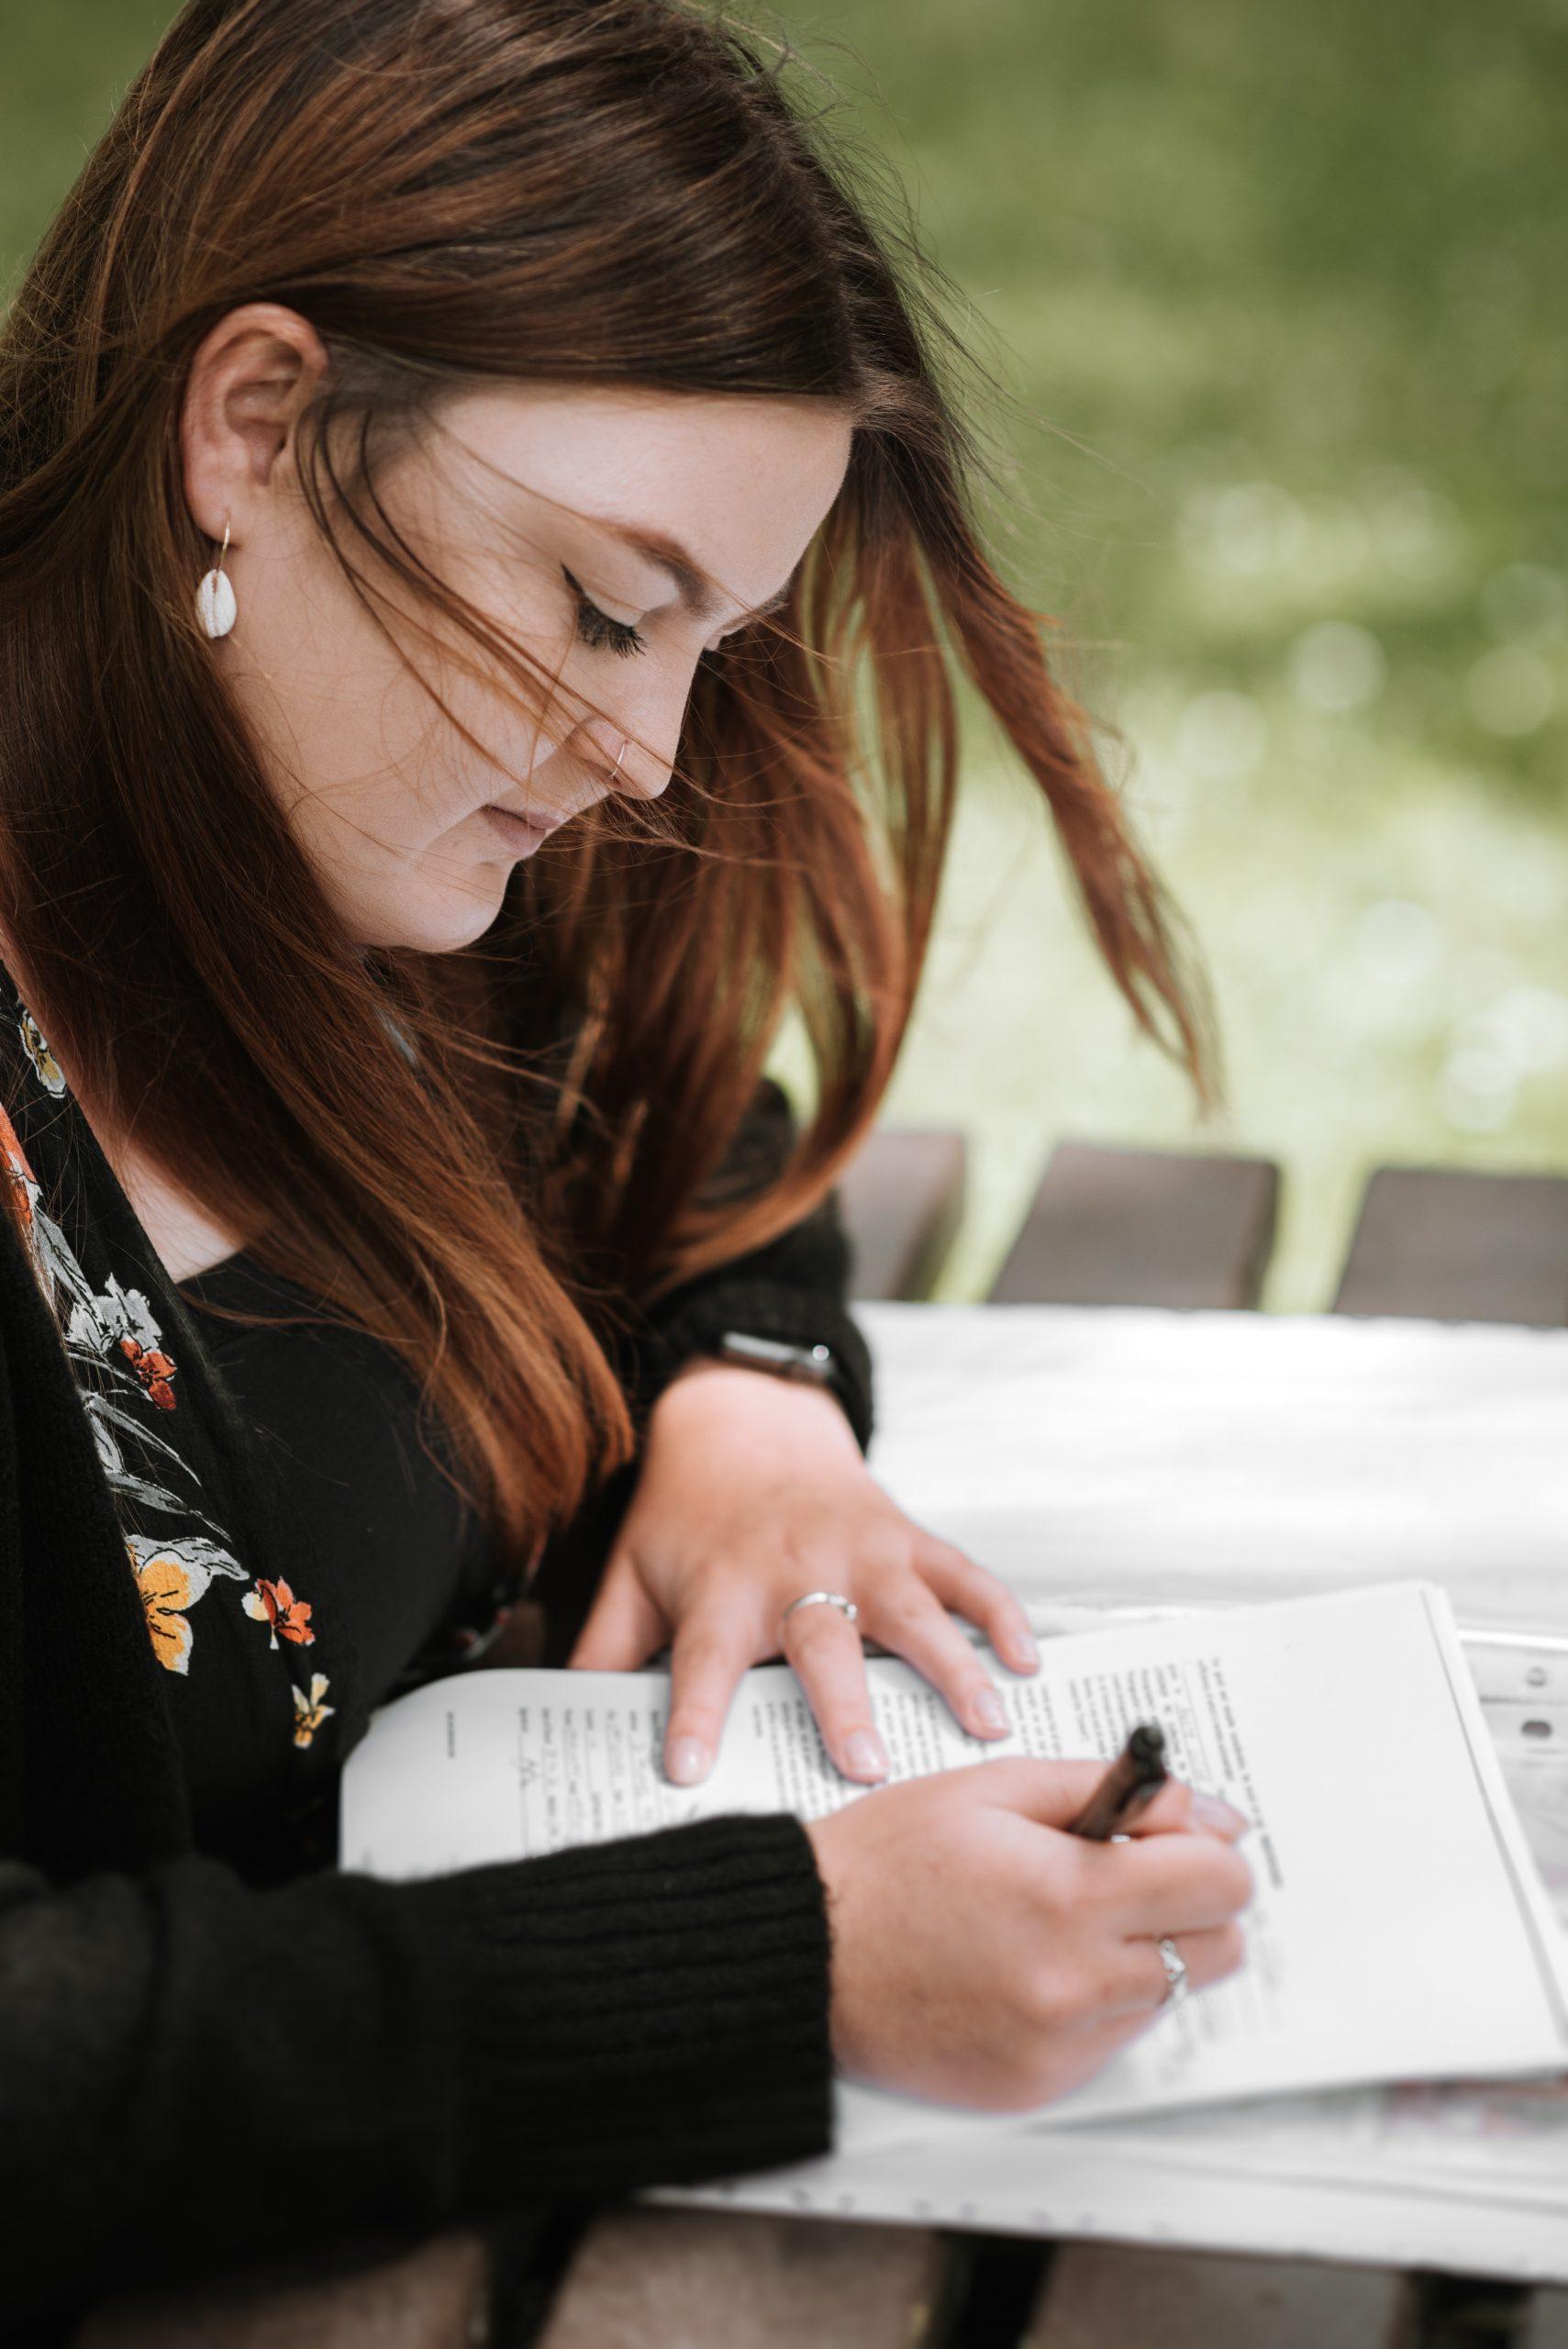 Woman writing an essay